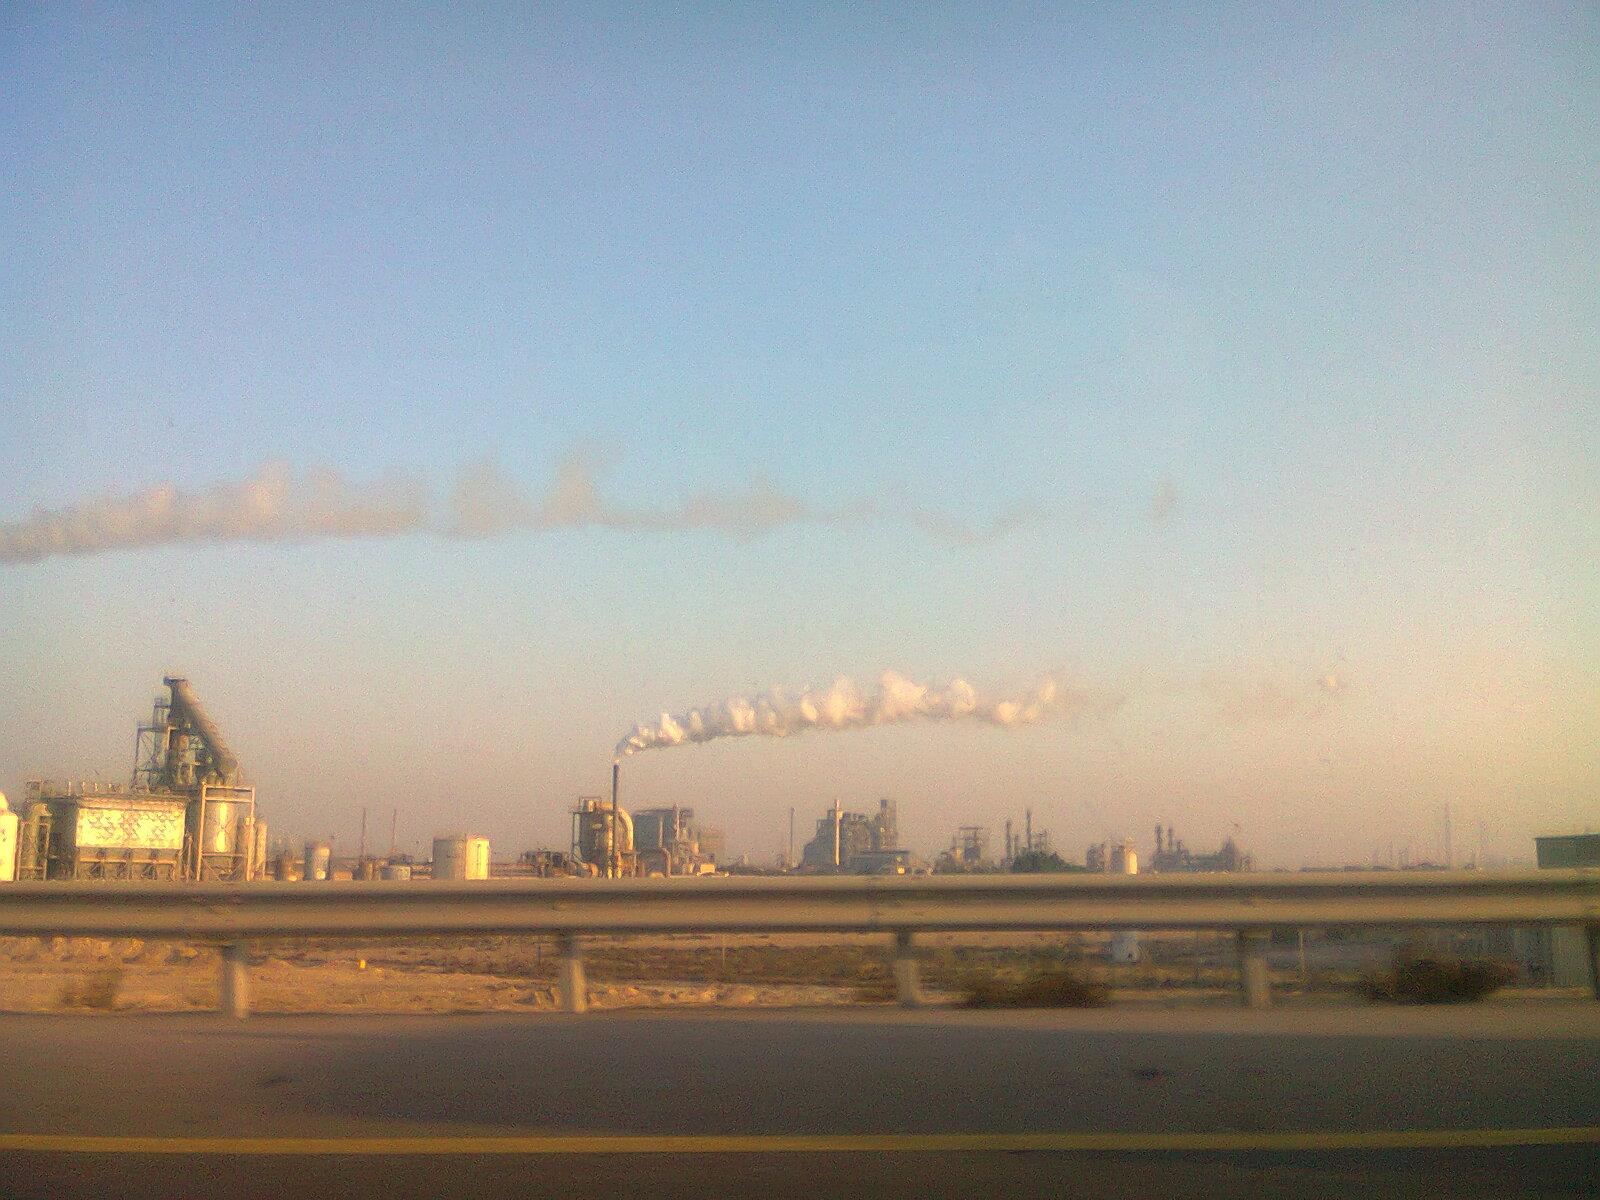 Aramco_petro_chemicals,jubail_,Saudi_Arabia_-_panoramio.jpg